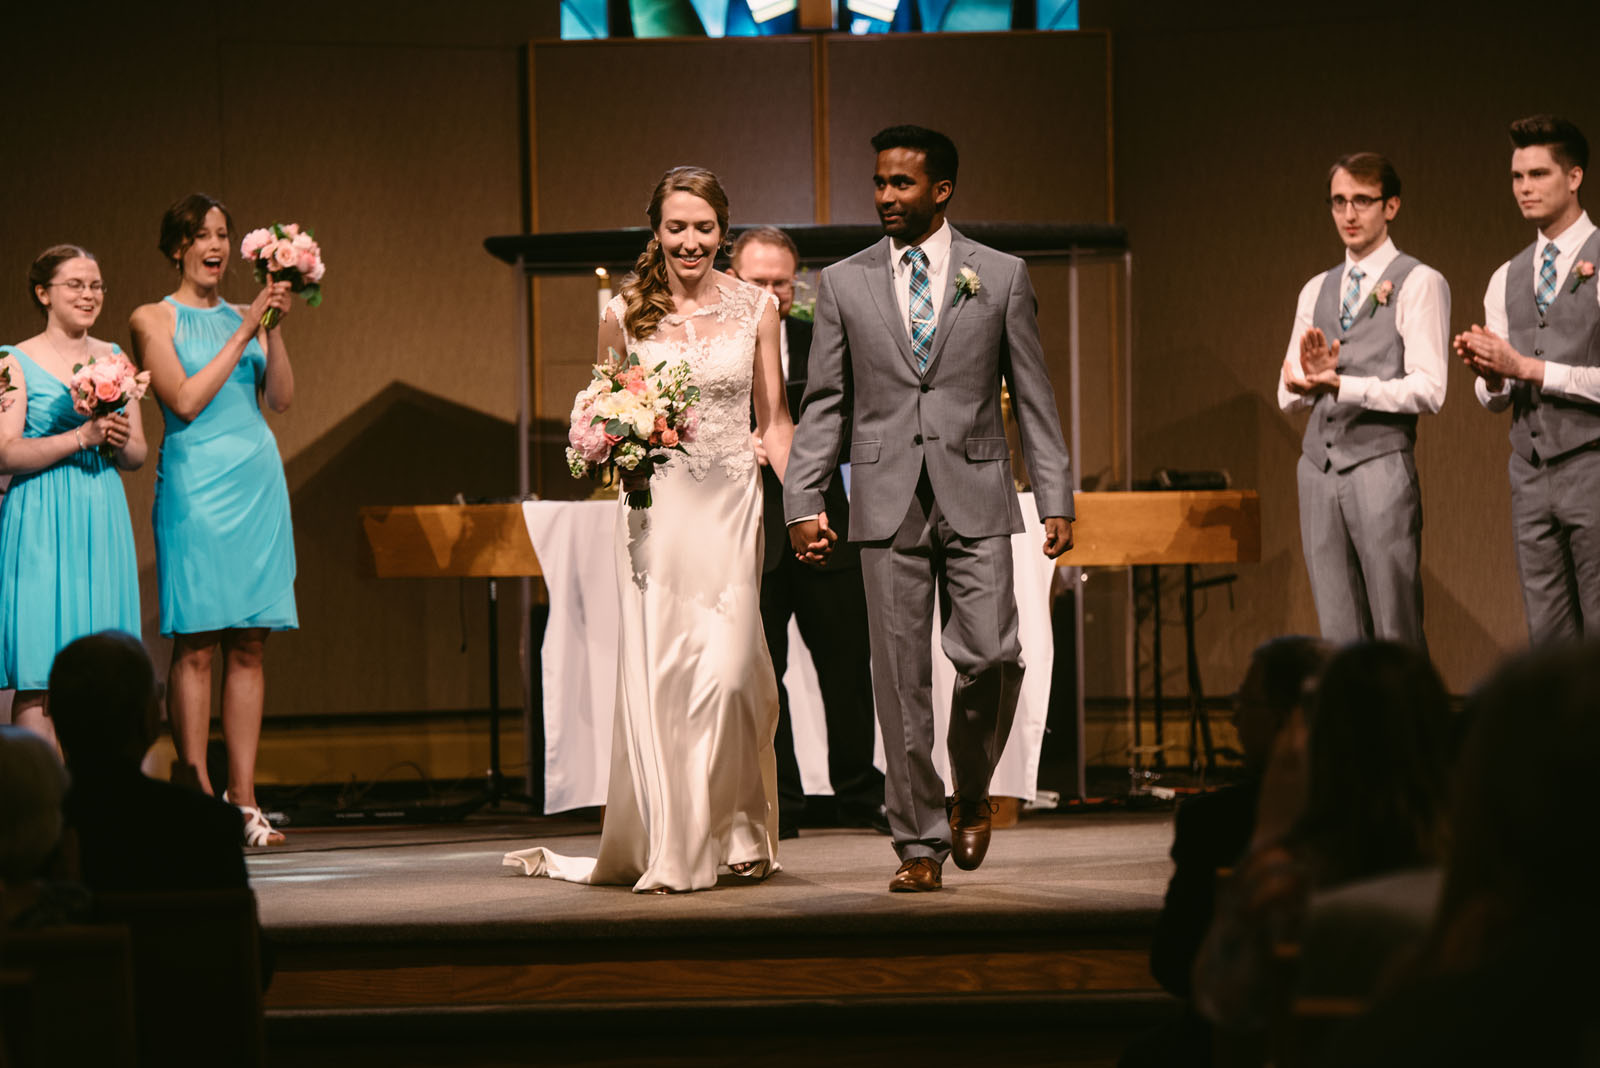 bloomington-minnesota-wedding-photographer.jpg